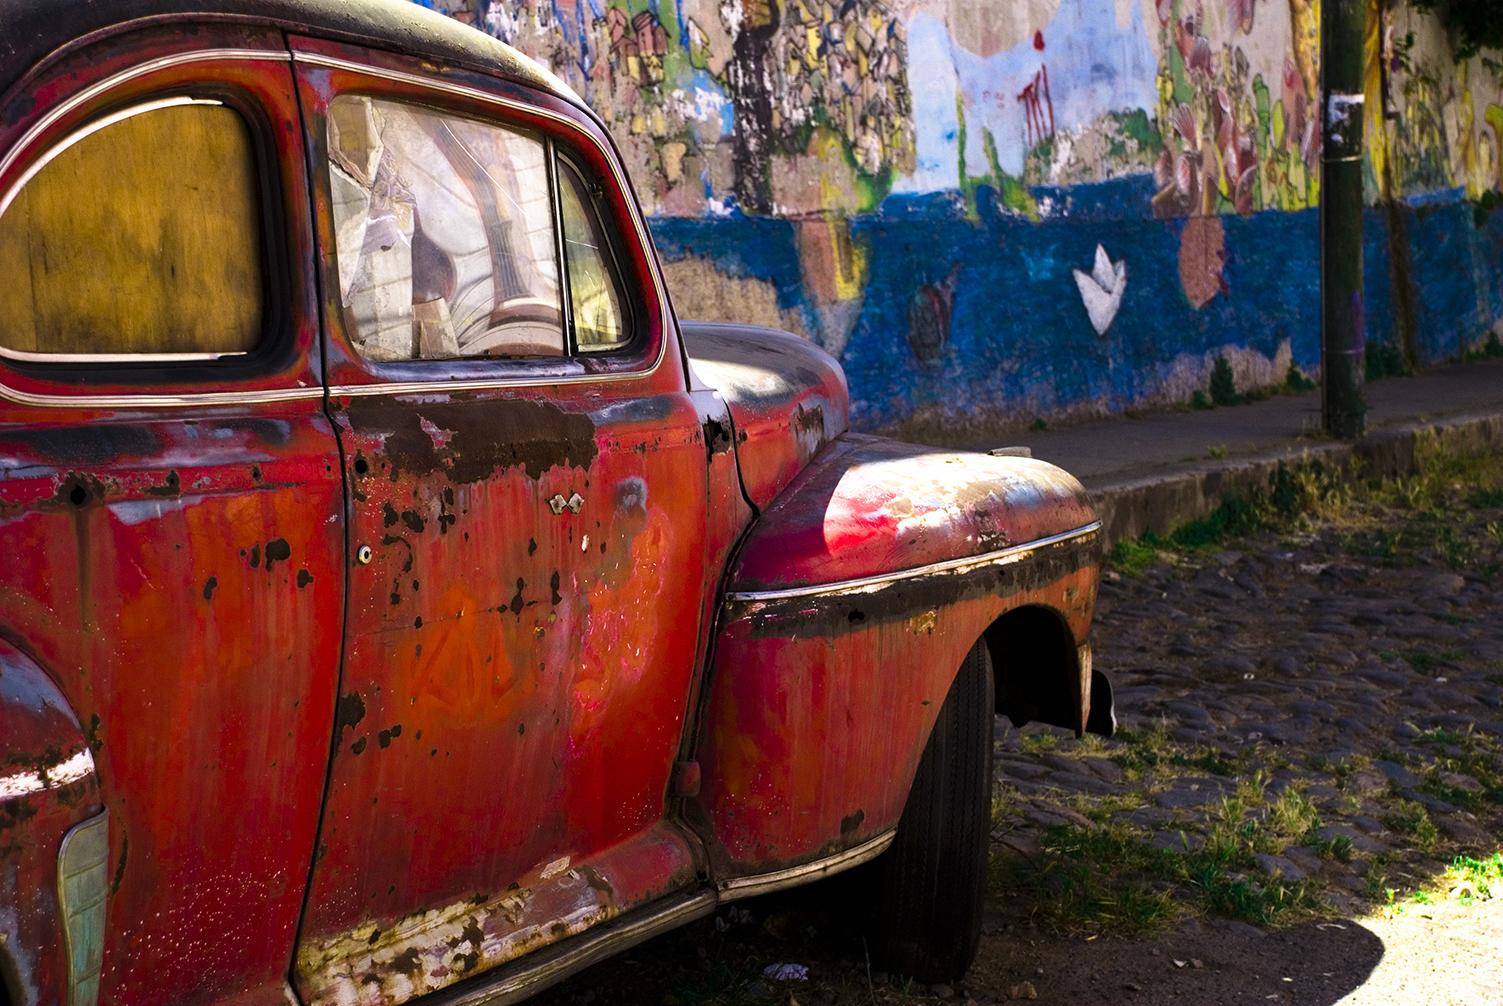 Old Cars in Valparaíso